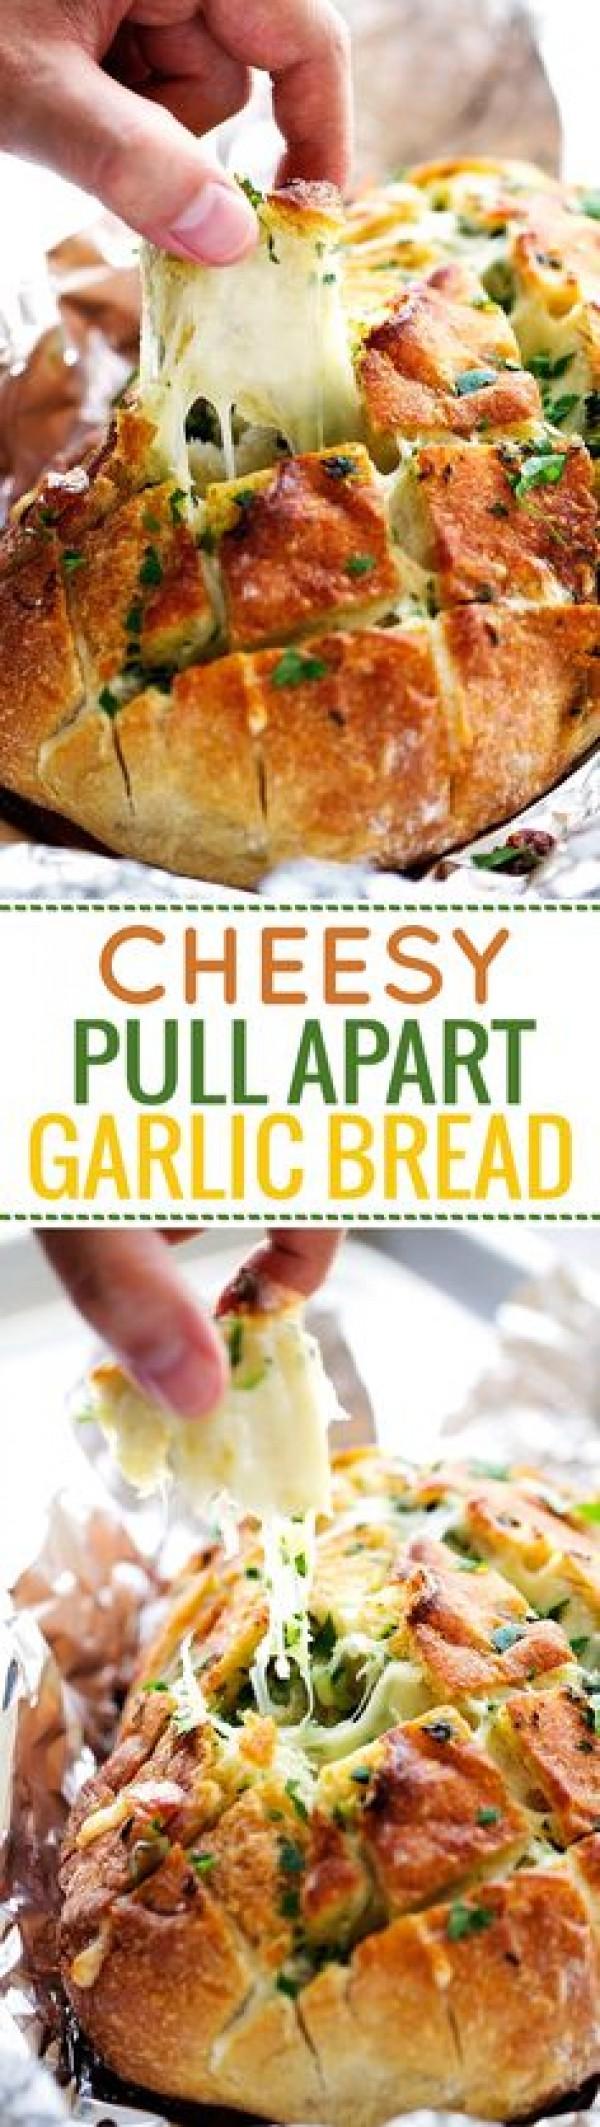 Get the recipe Cheese Garlic Bread @recipes_to_go